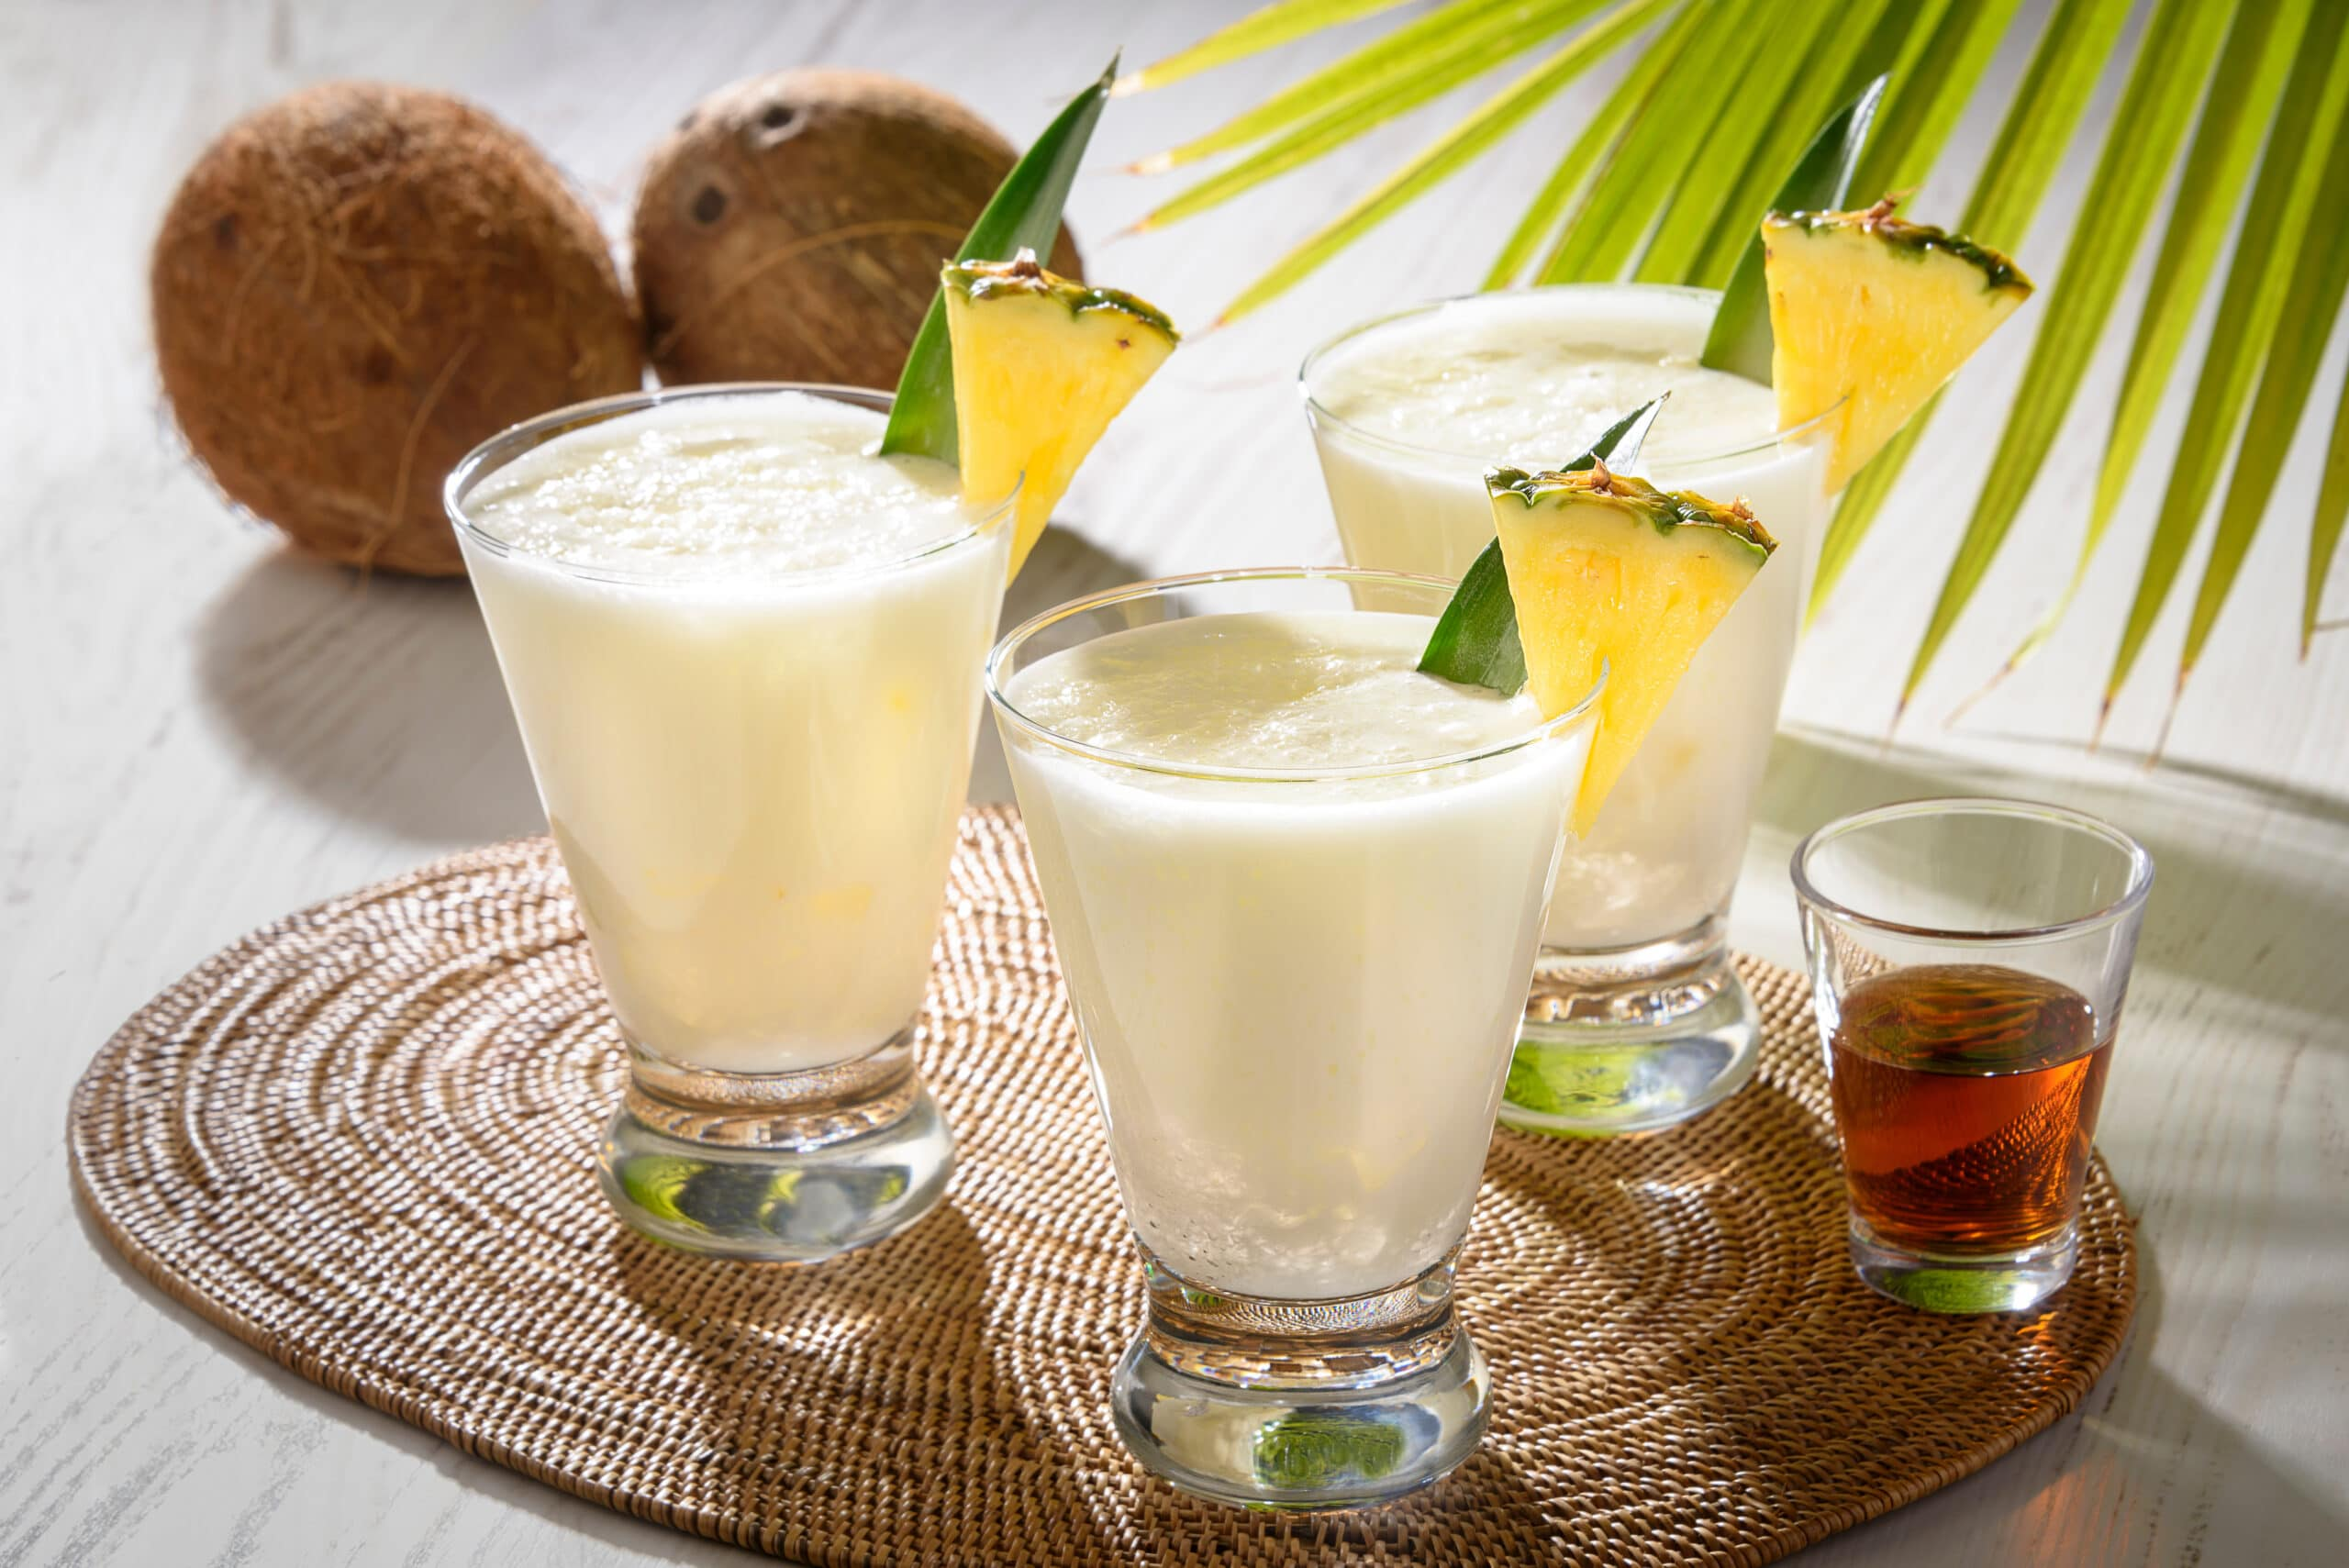 Royal-Caribbean-International-Cocktail-Drankjes-Pina-Colada